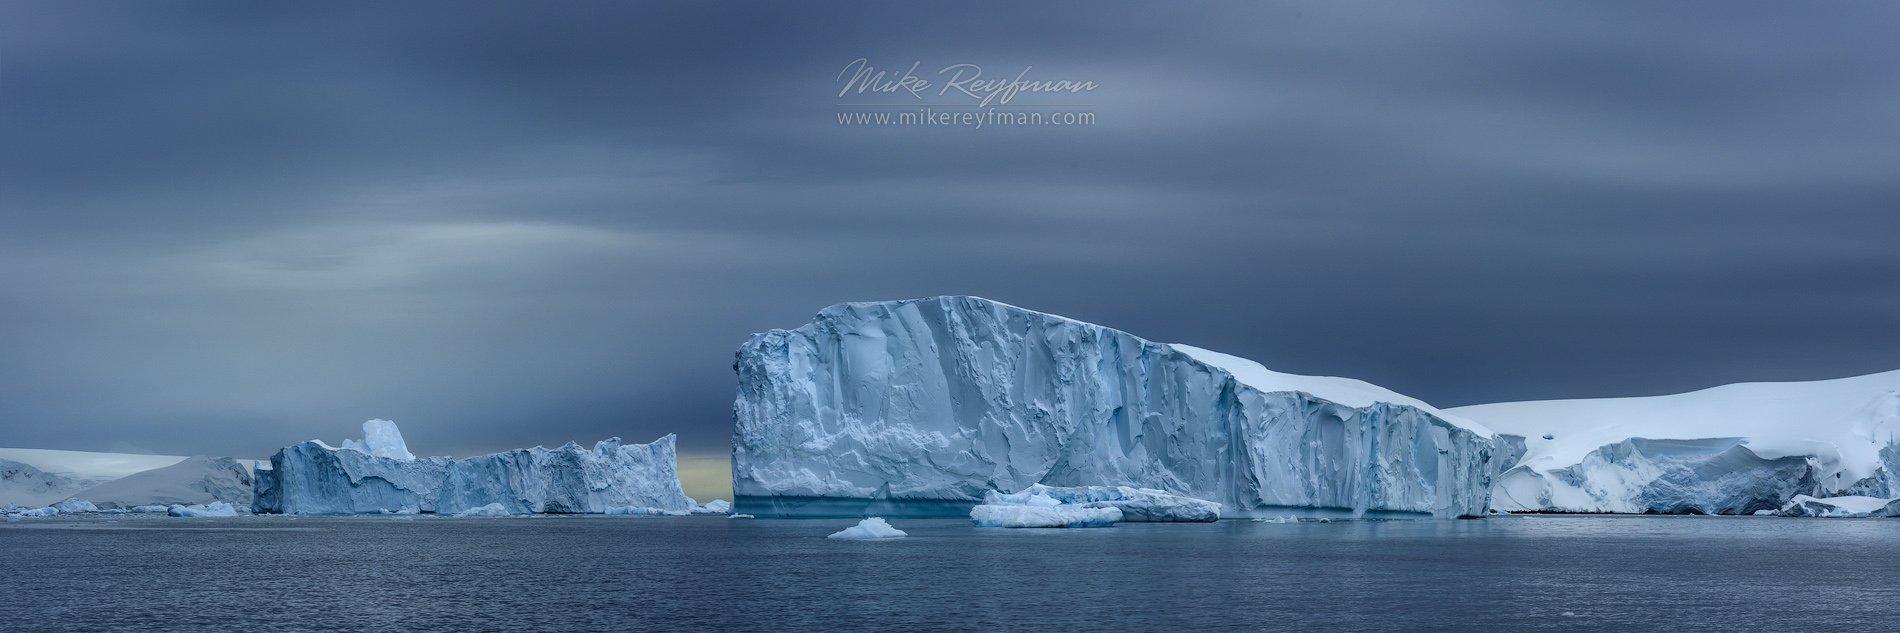 antarctica. photo-trip, iceberg., photo-travels, фото-тур, фото-экспедиция, Майк Рейфман